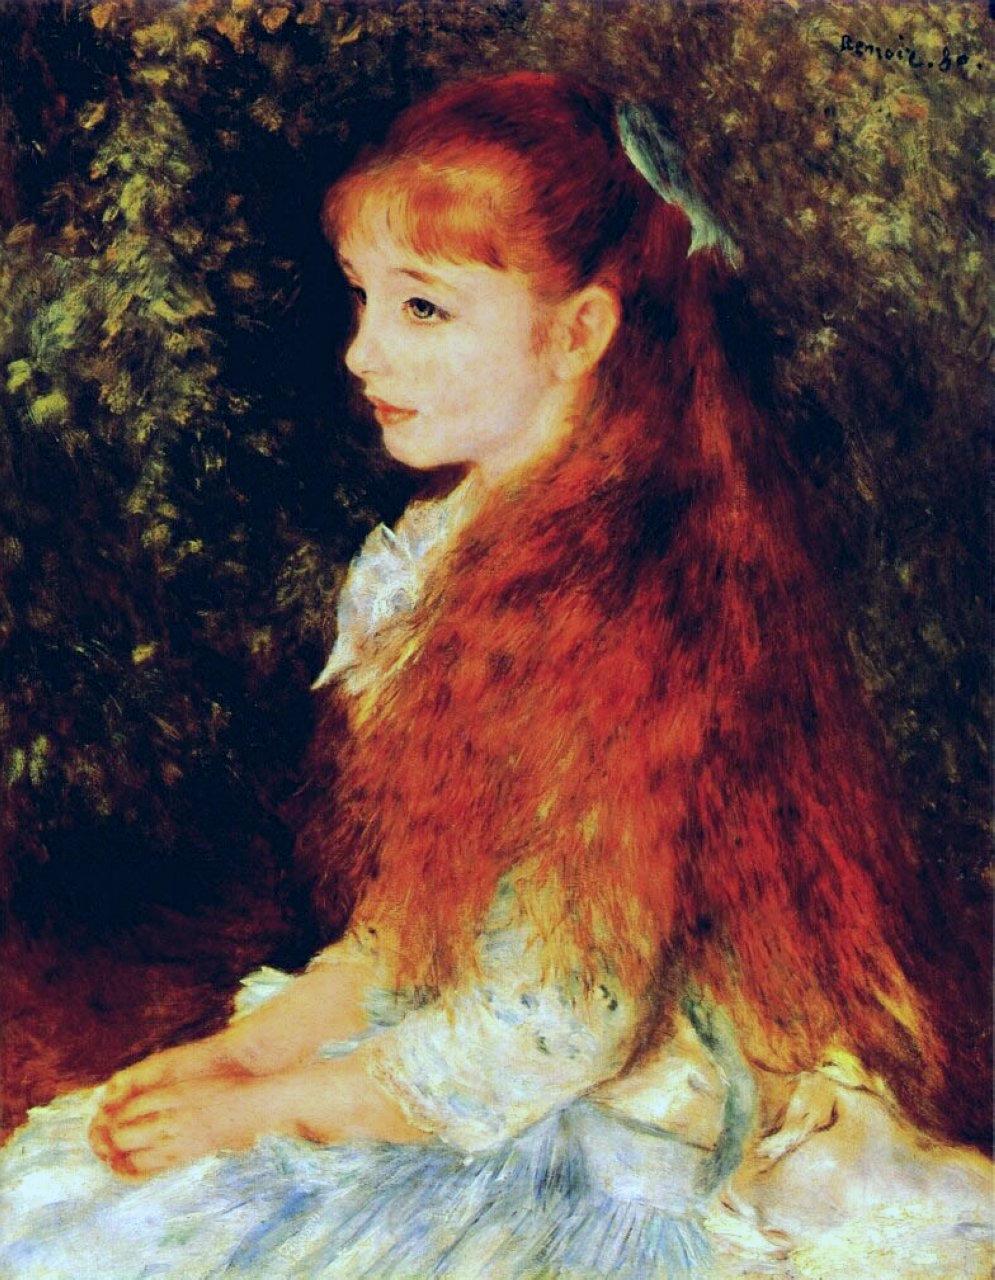 http://uploads4.wikiart.org/images/pierre-auguste-renoir/mlle-irene-cahen-d-anvers-1880.jpg